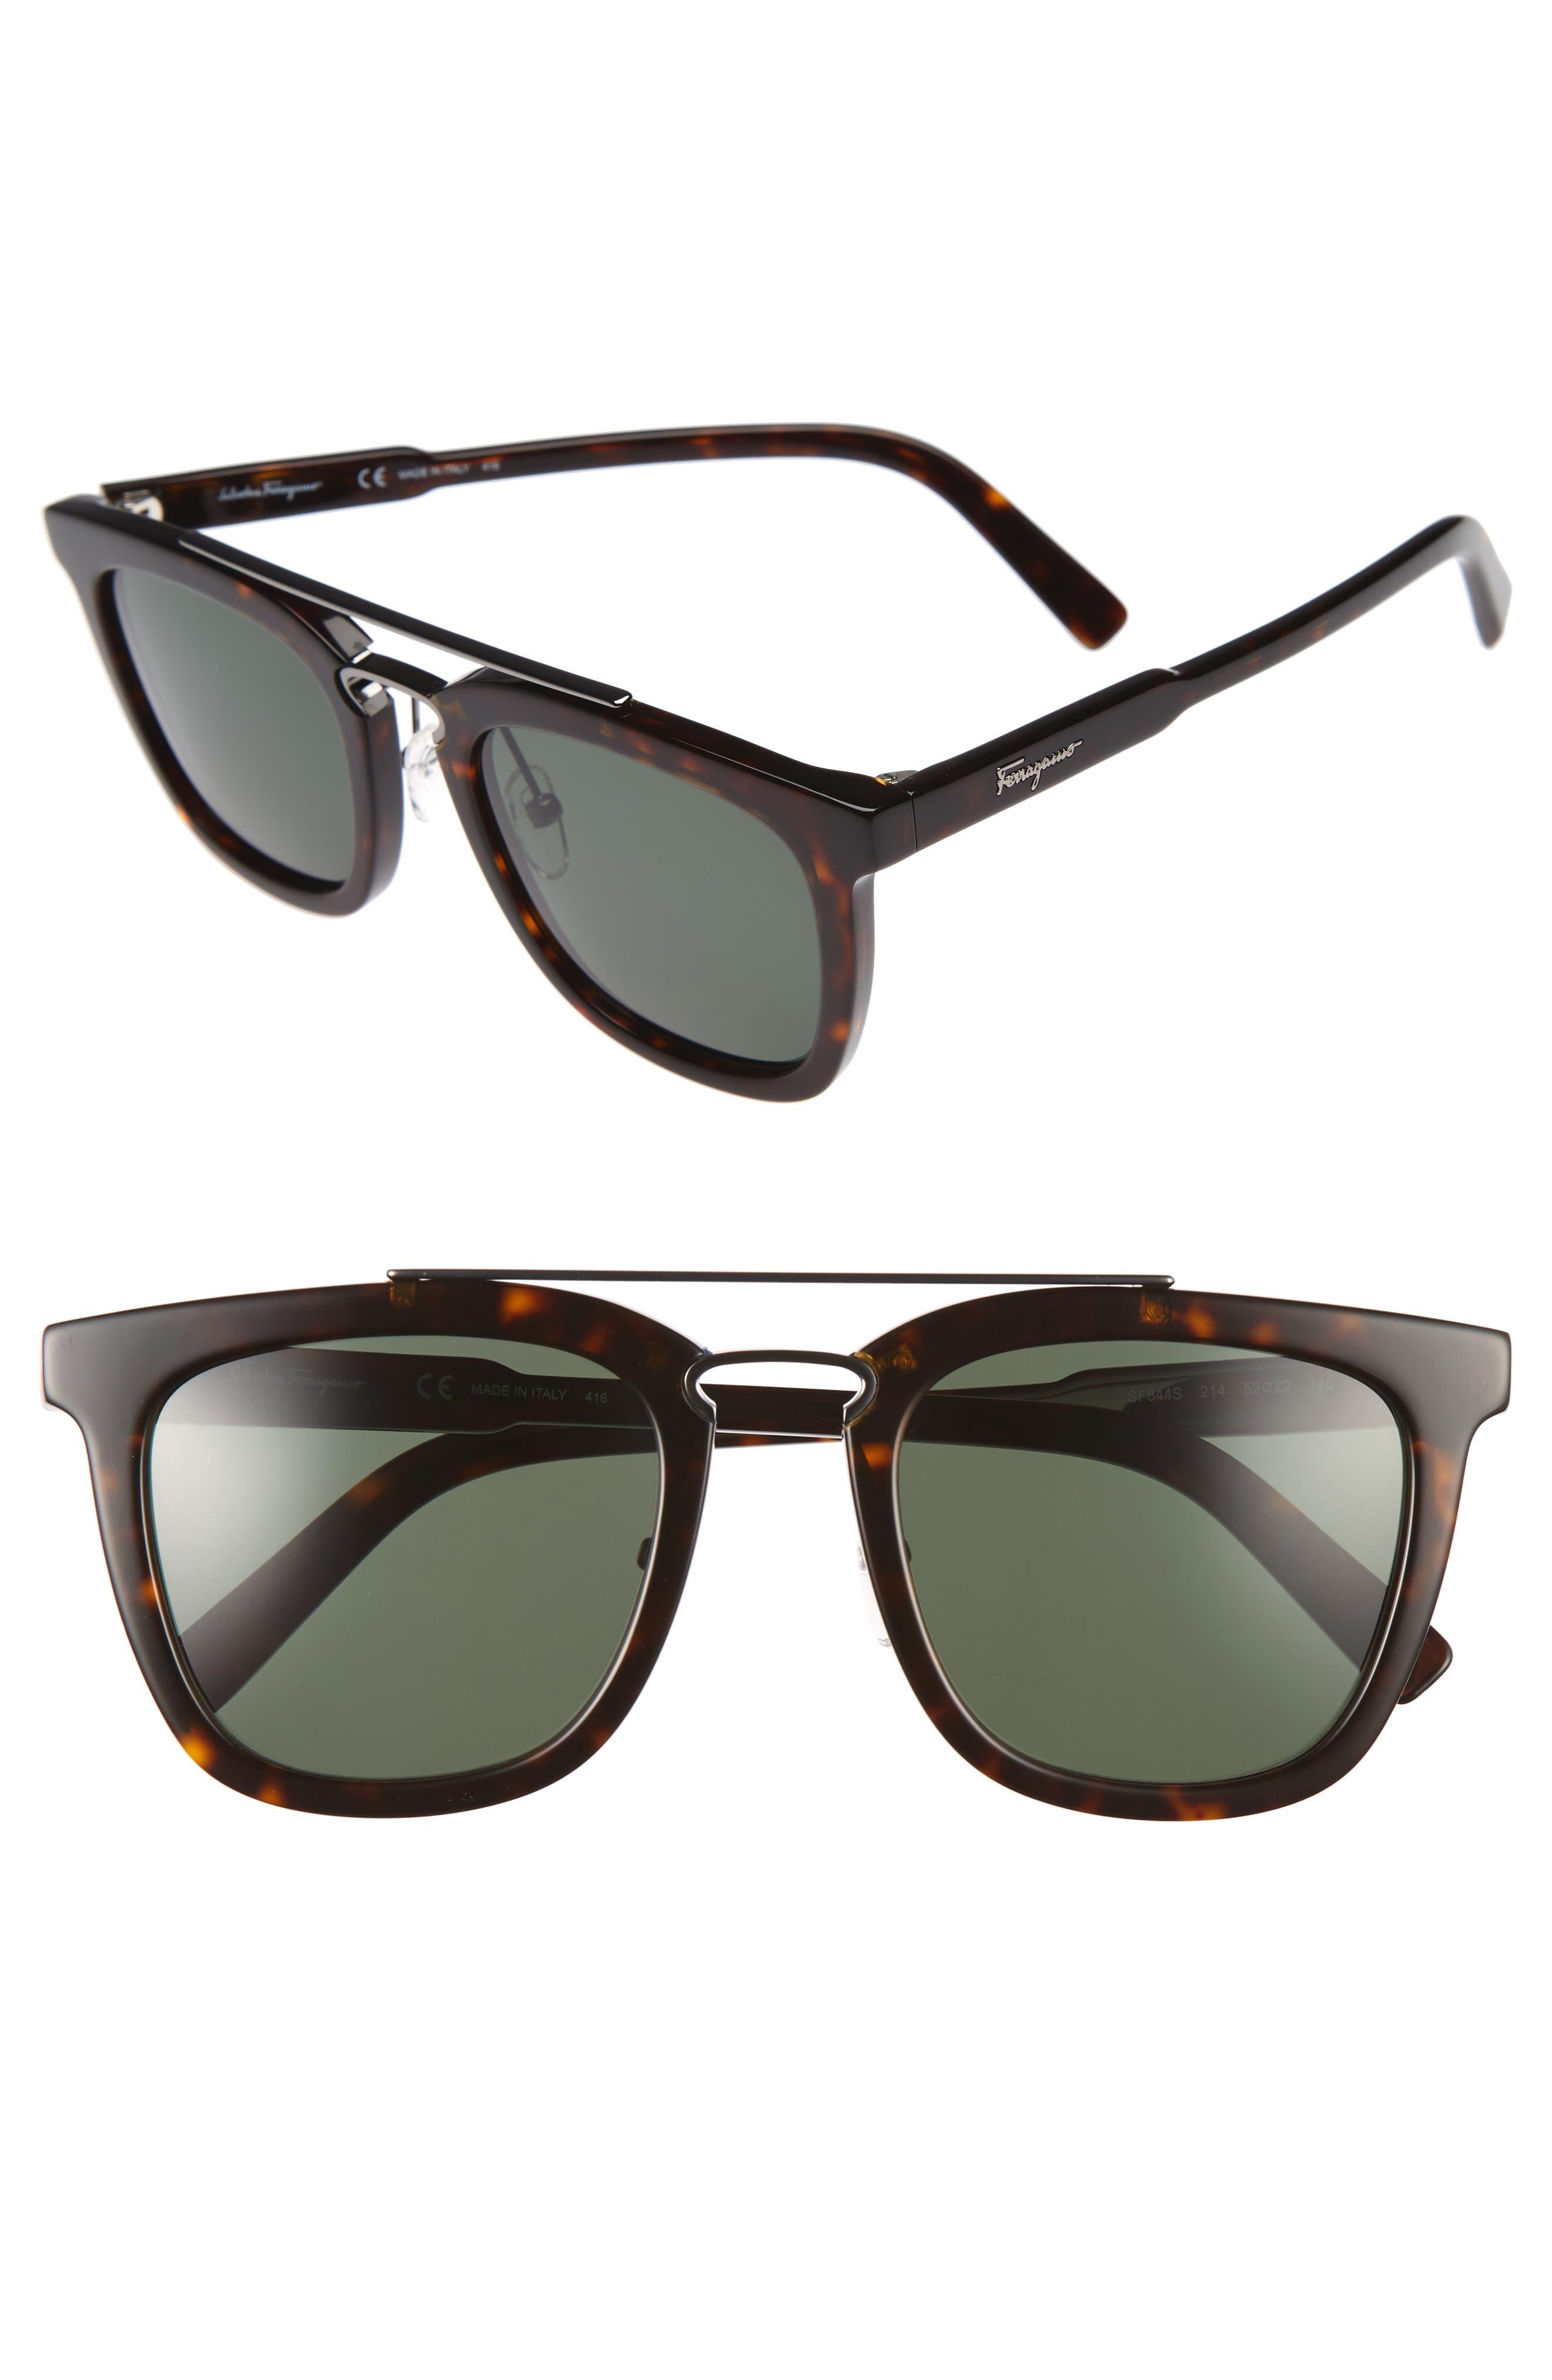 52mm Sunglasses,                             Main thumbnail 1, color,                             Tortoise